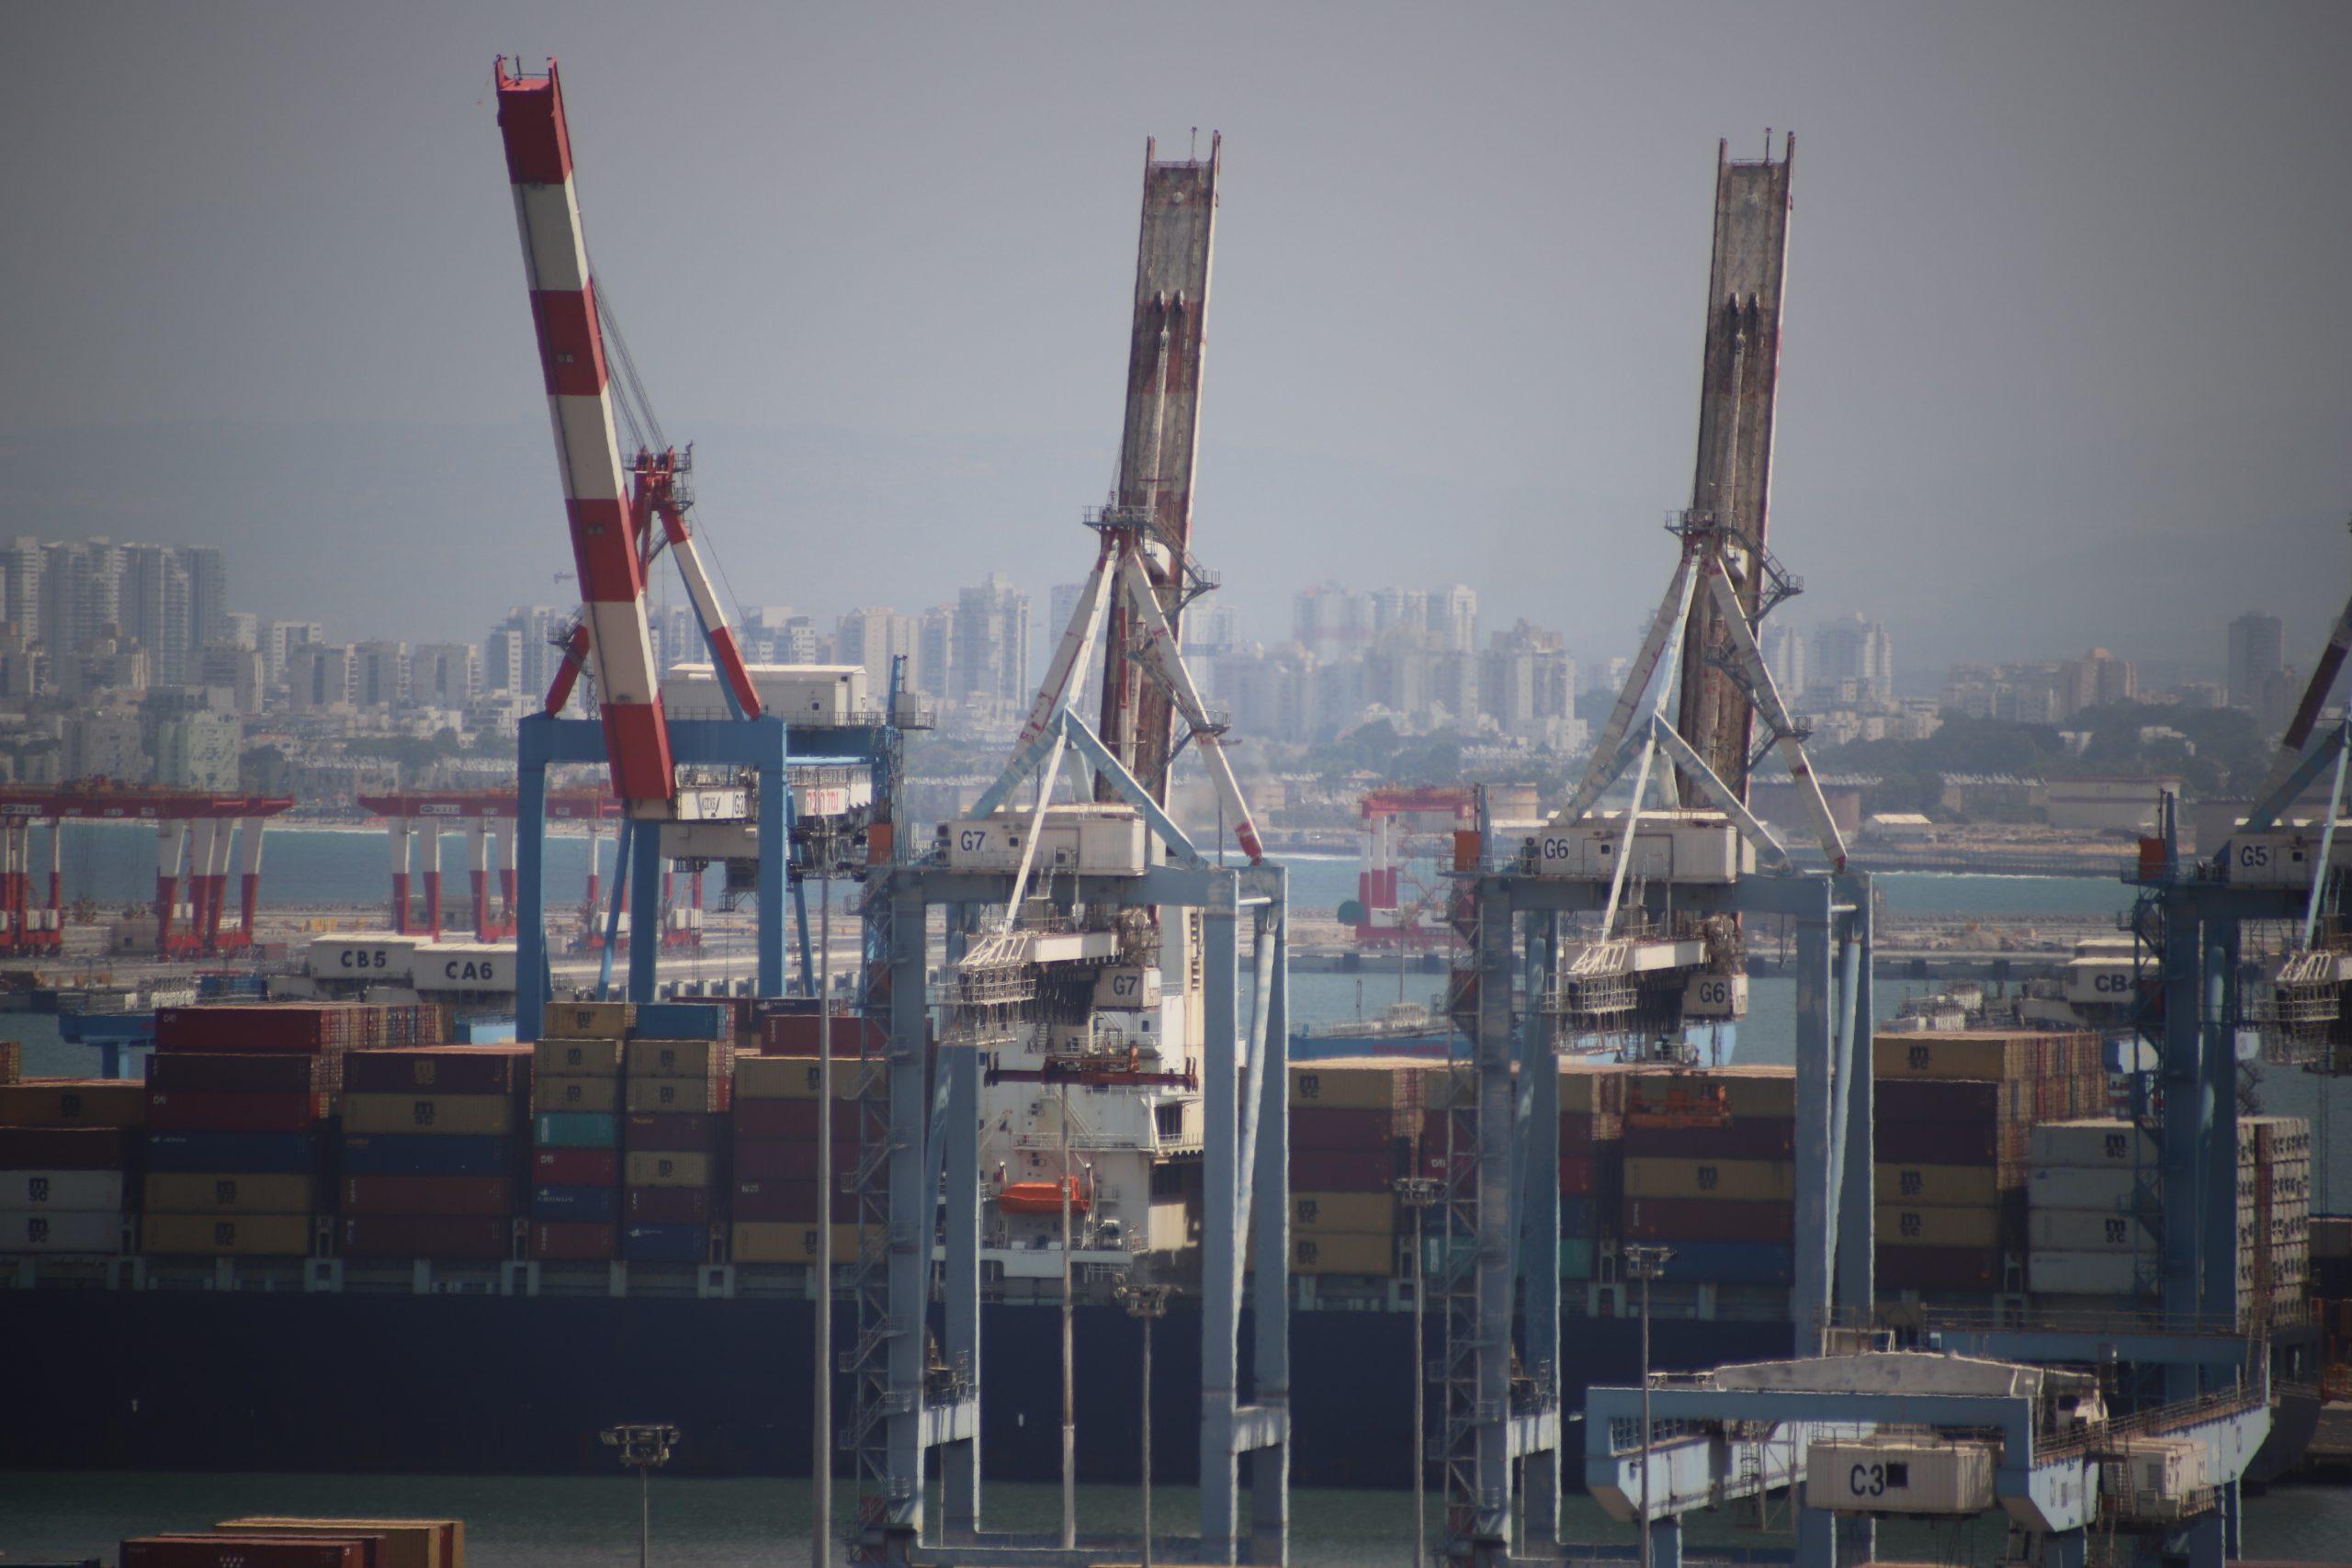 Haifa: A Tale of Two Ports